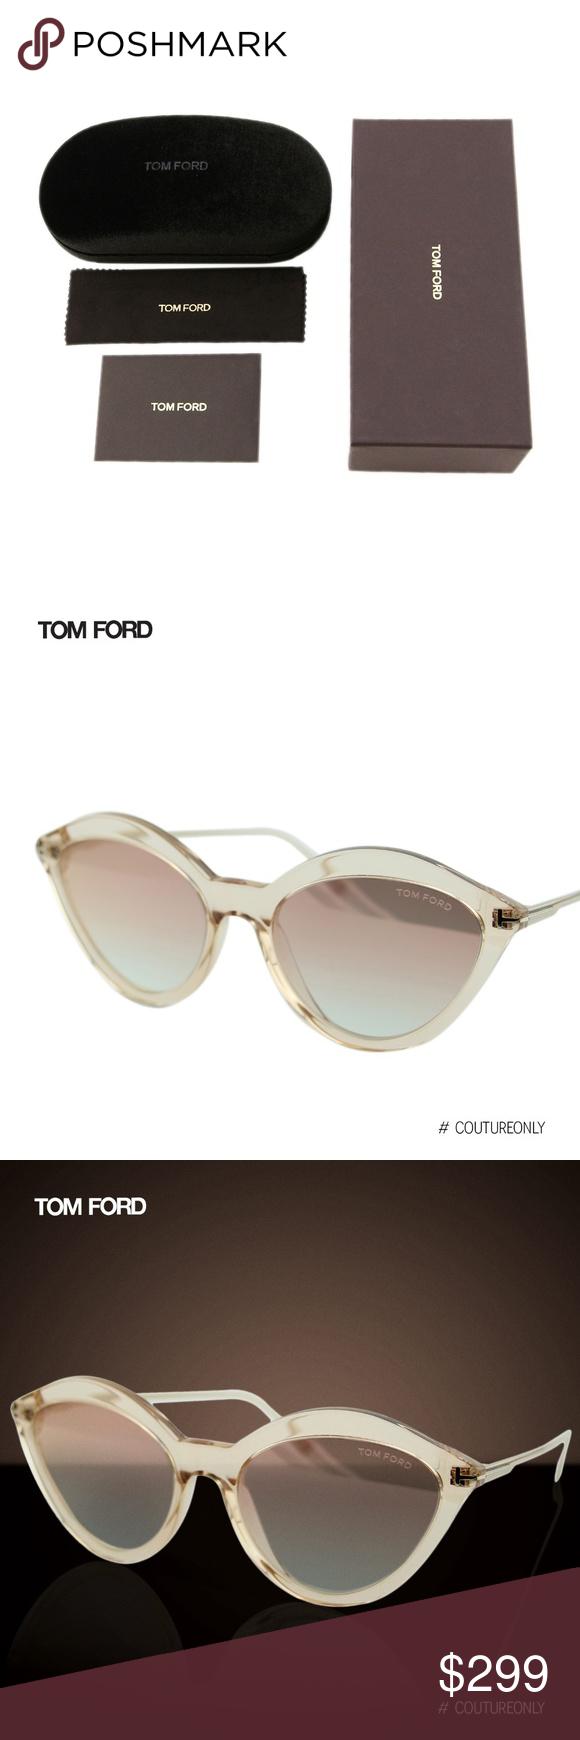 45d8a8ae18482 New 2019 Tom Ford Chloe FT0663 Cat Eye Sunglasses SKU  FT-0663-45G ...